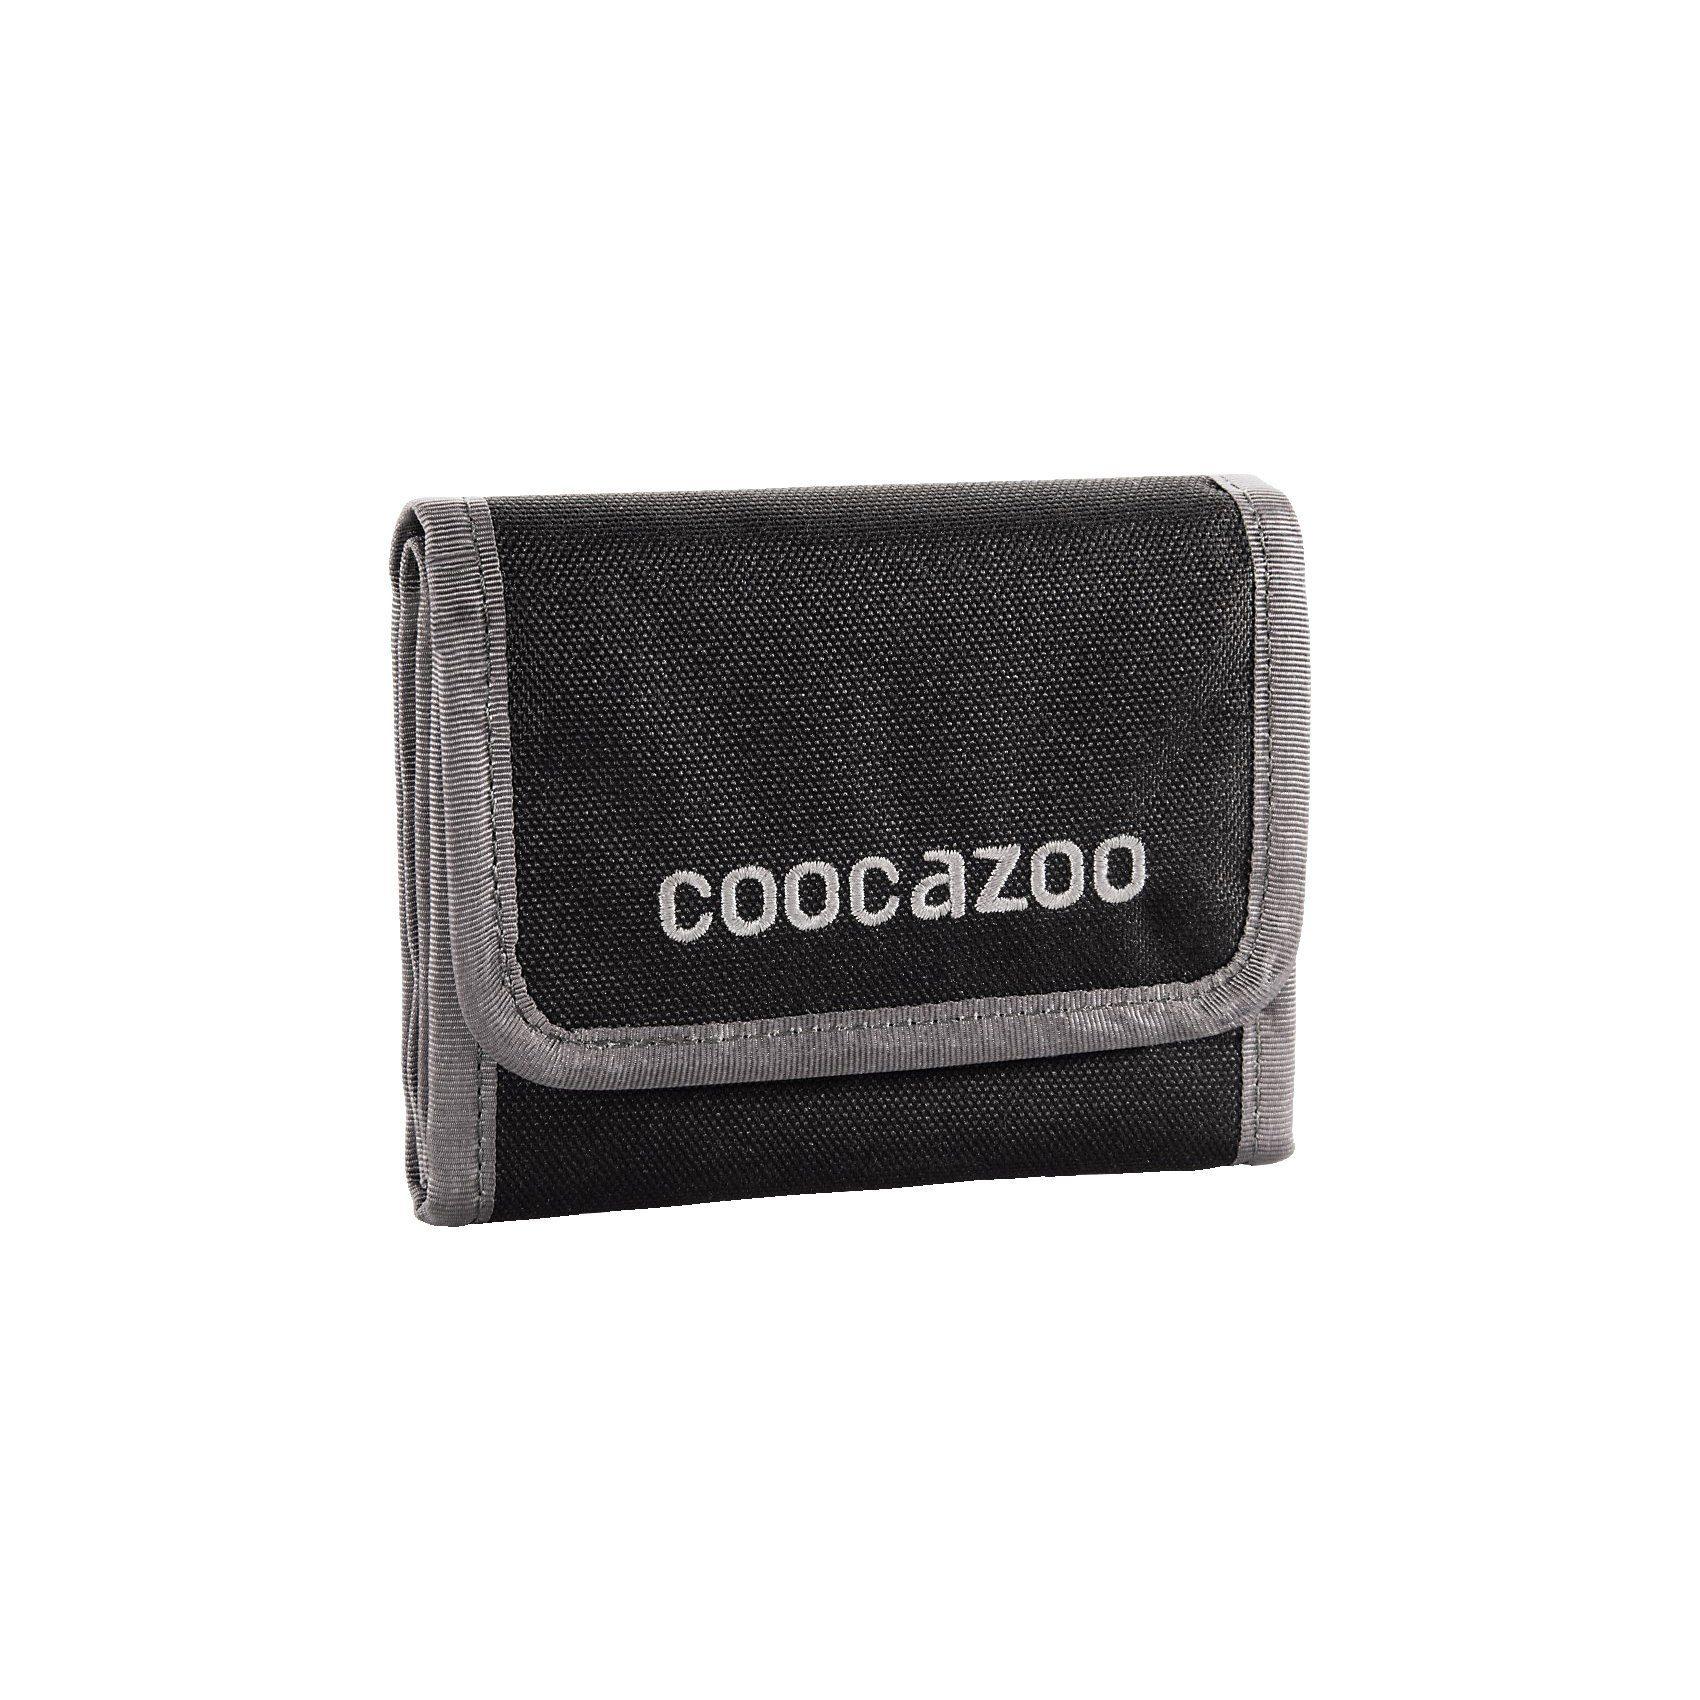 Coocazoo Geldbörse CashDash Beautiful Black